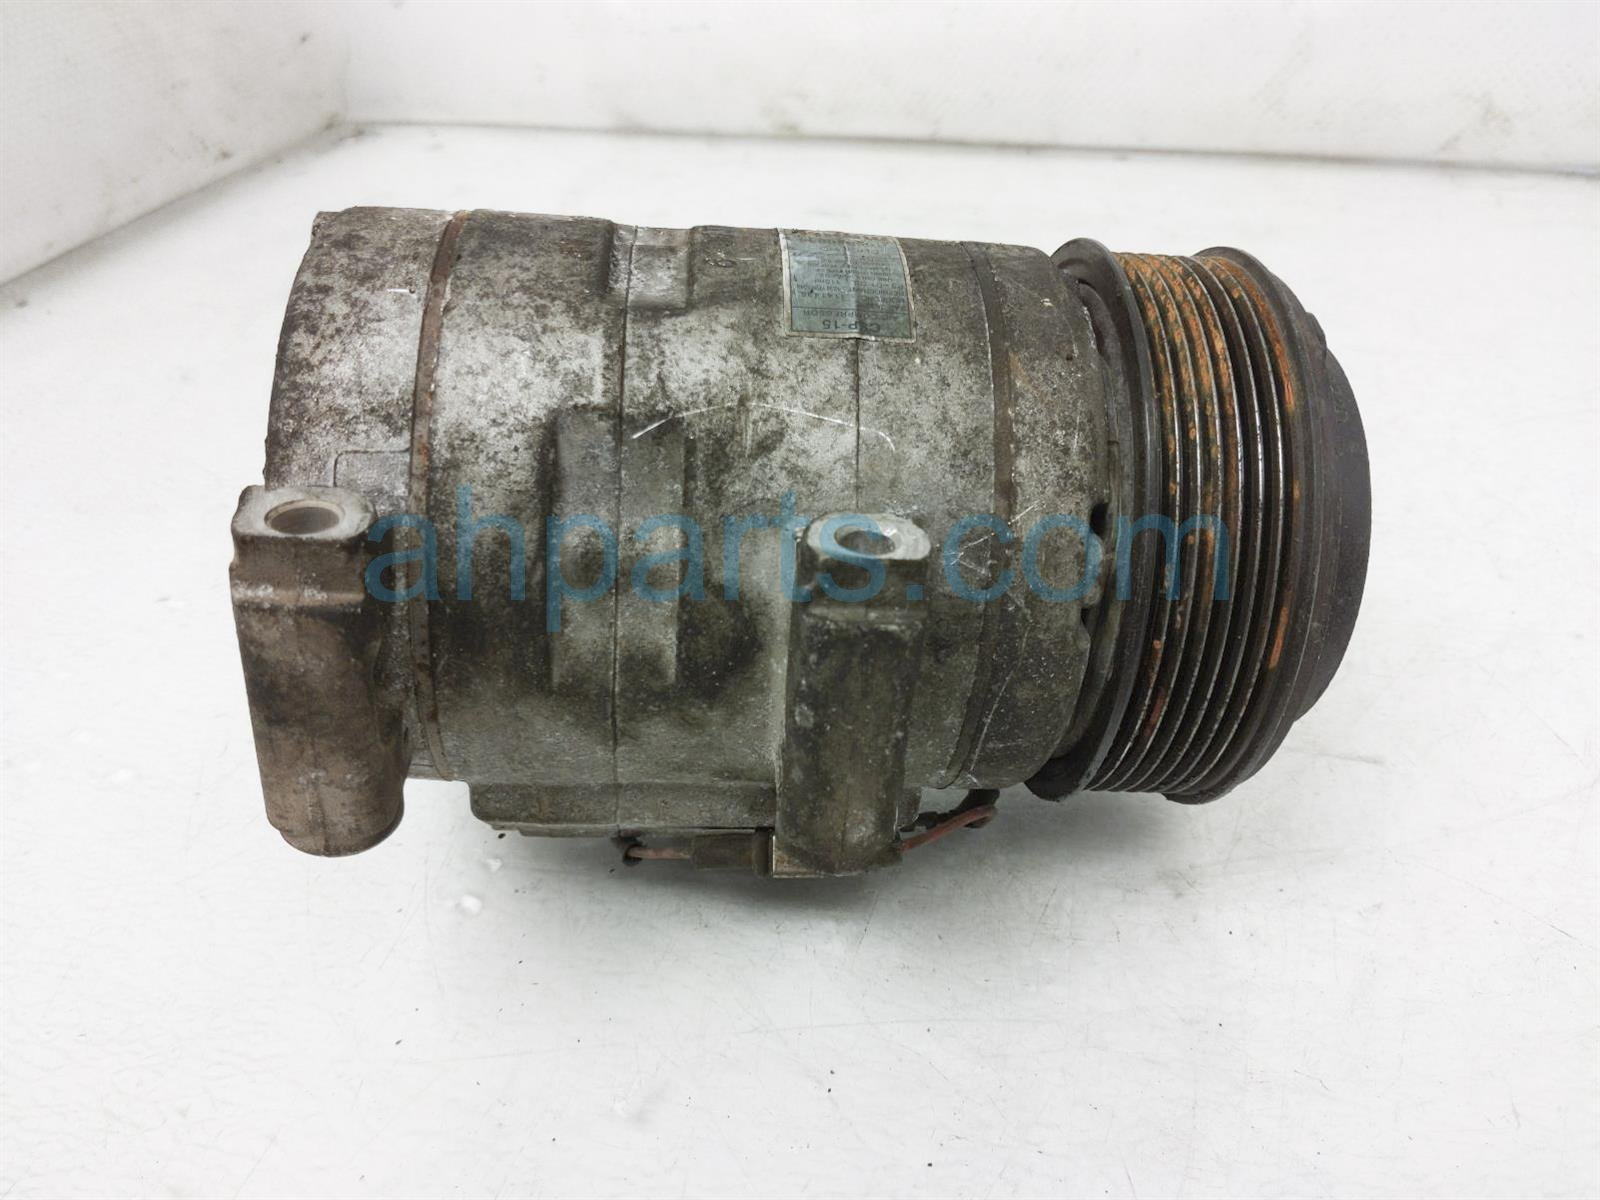 2017 Toyota Tacoma Air + Clutch Ac Pump / Compressor 88320 04070 Replacement